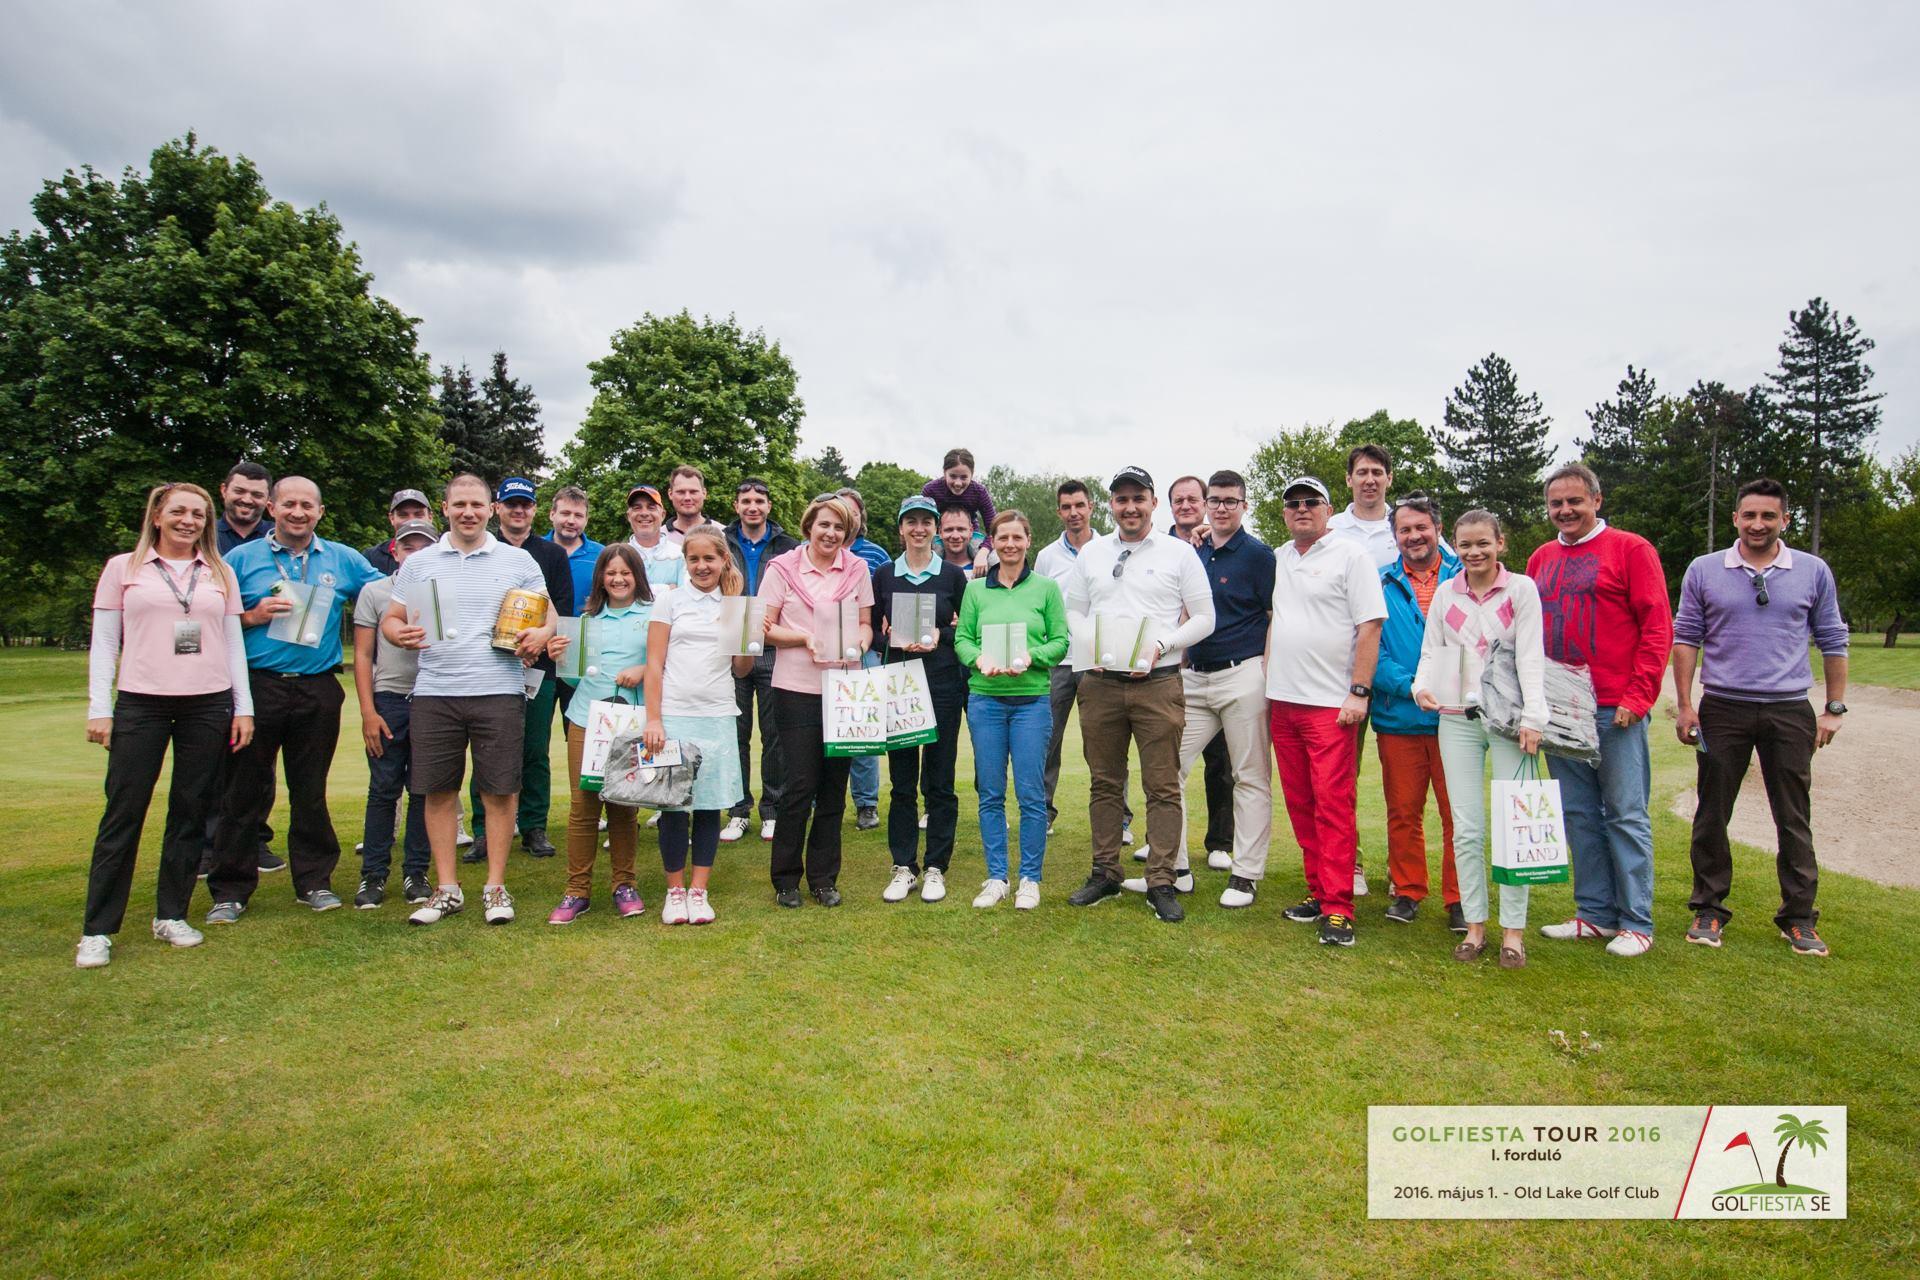 GF TOUR 2016 / I. – Old Lake Golf Club